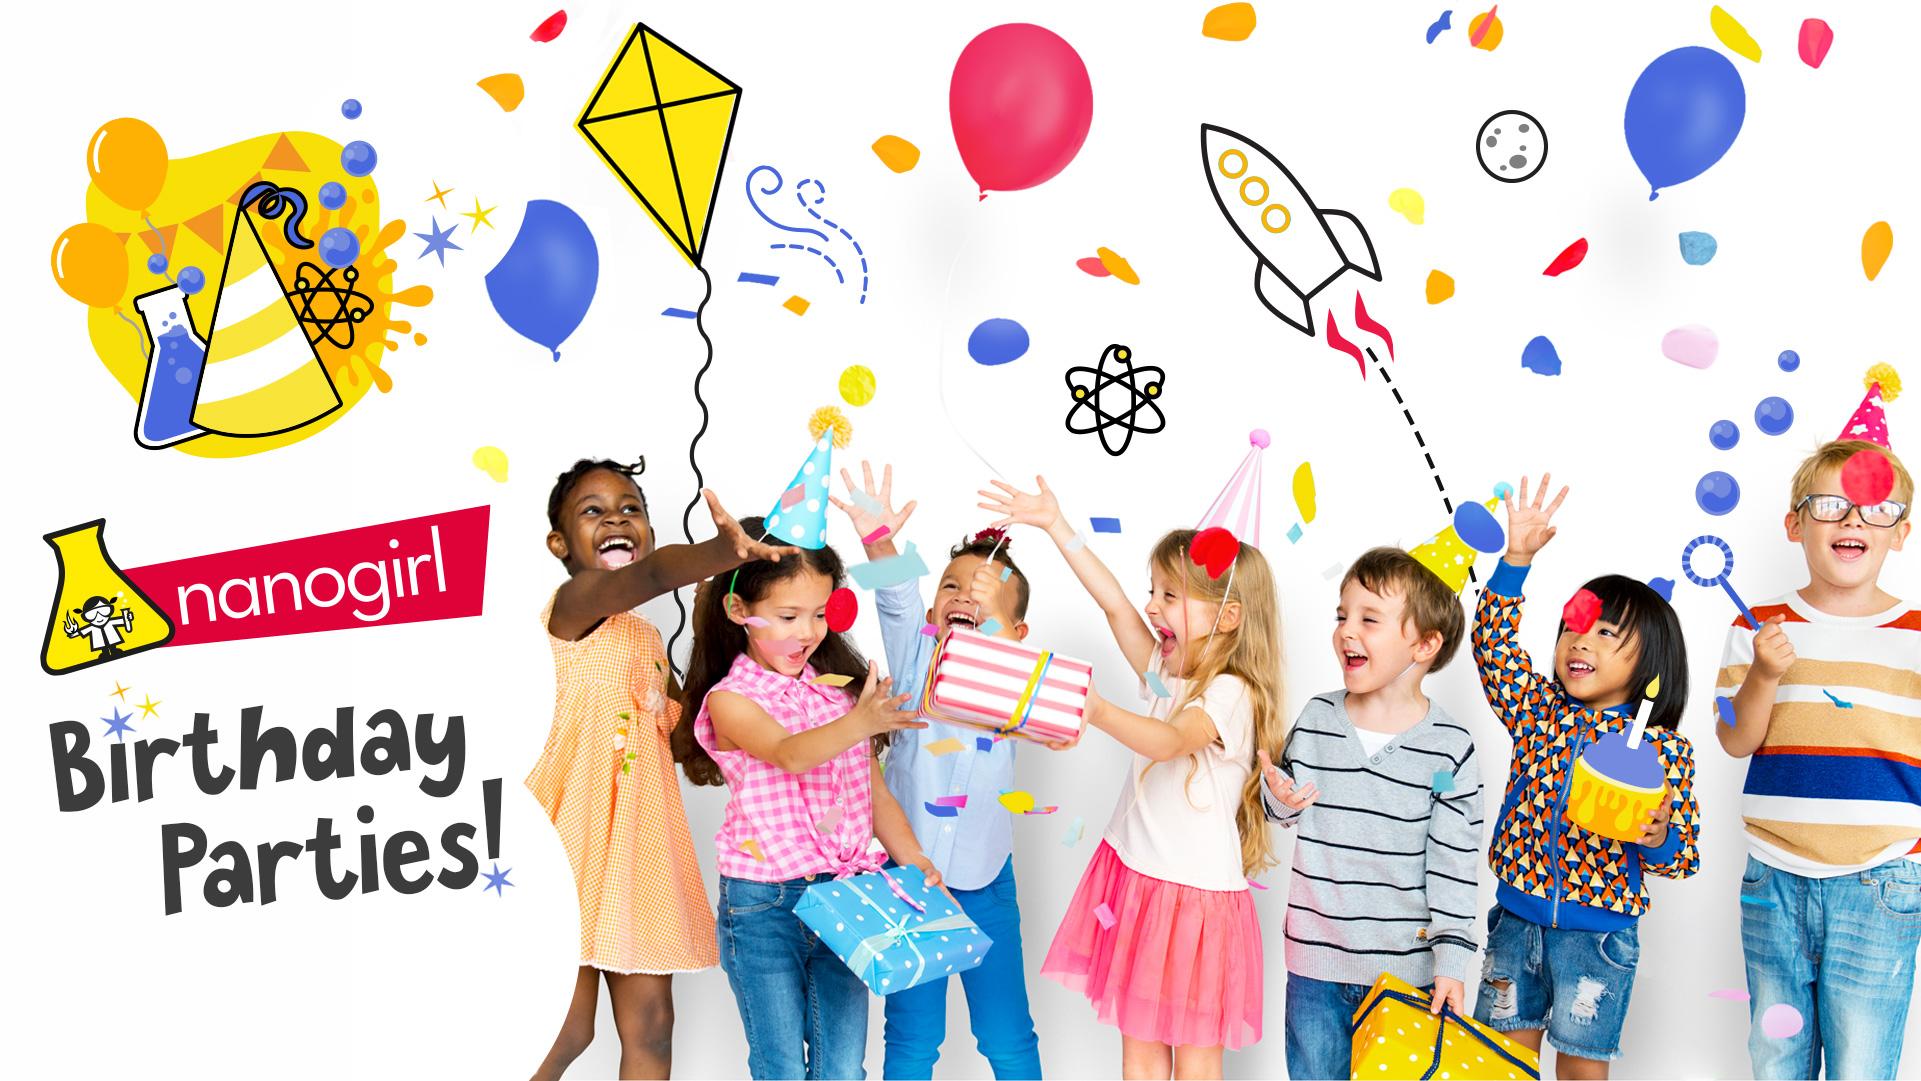 Nanogirl Birthday Parties Promotion Image